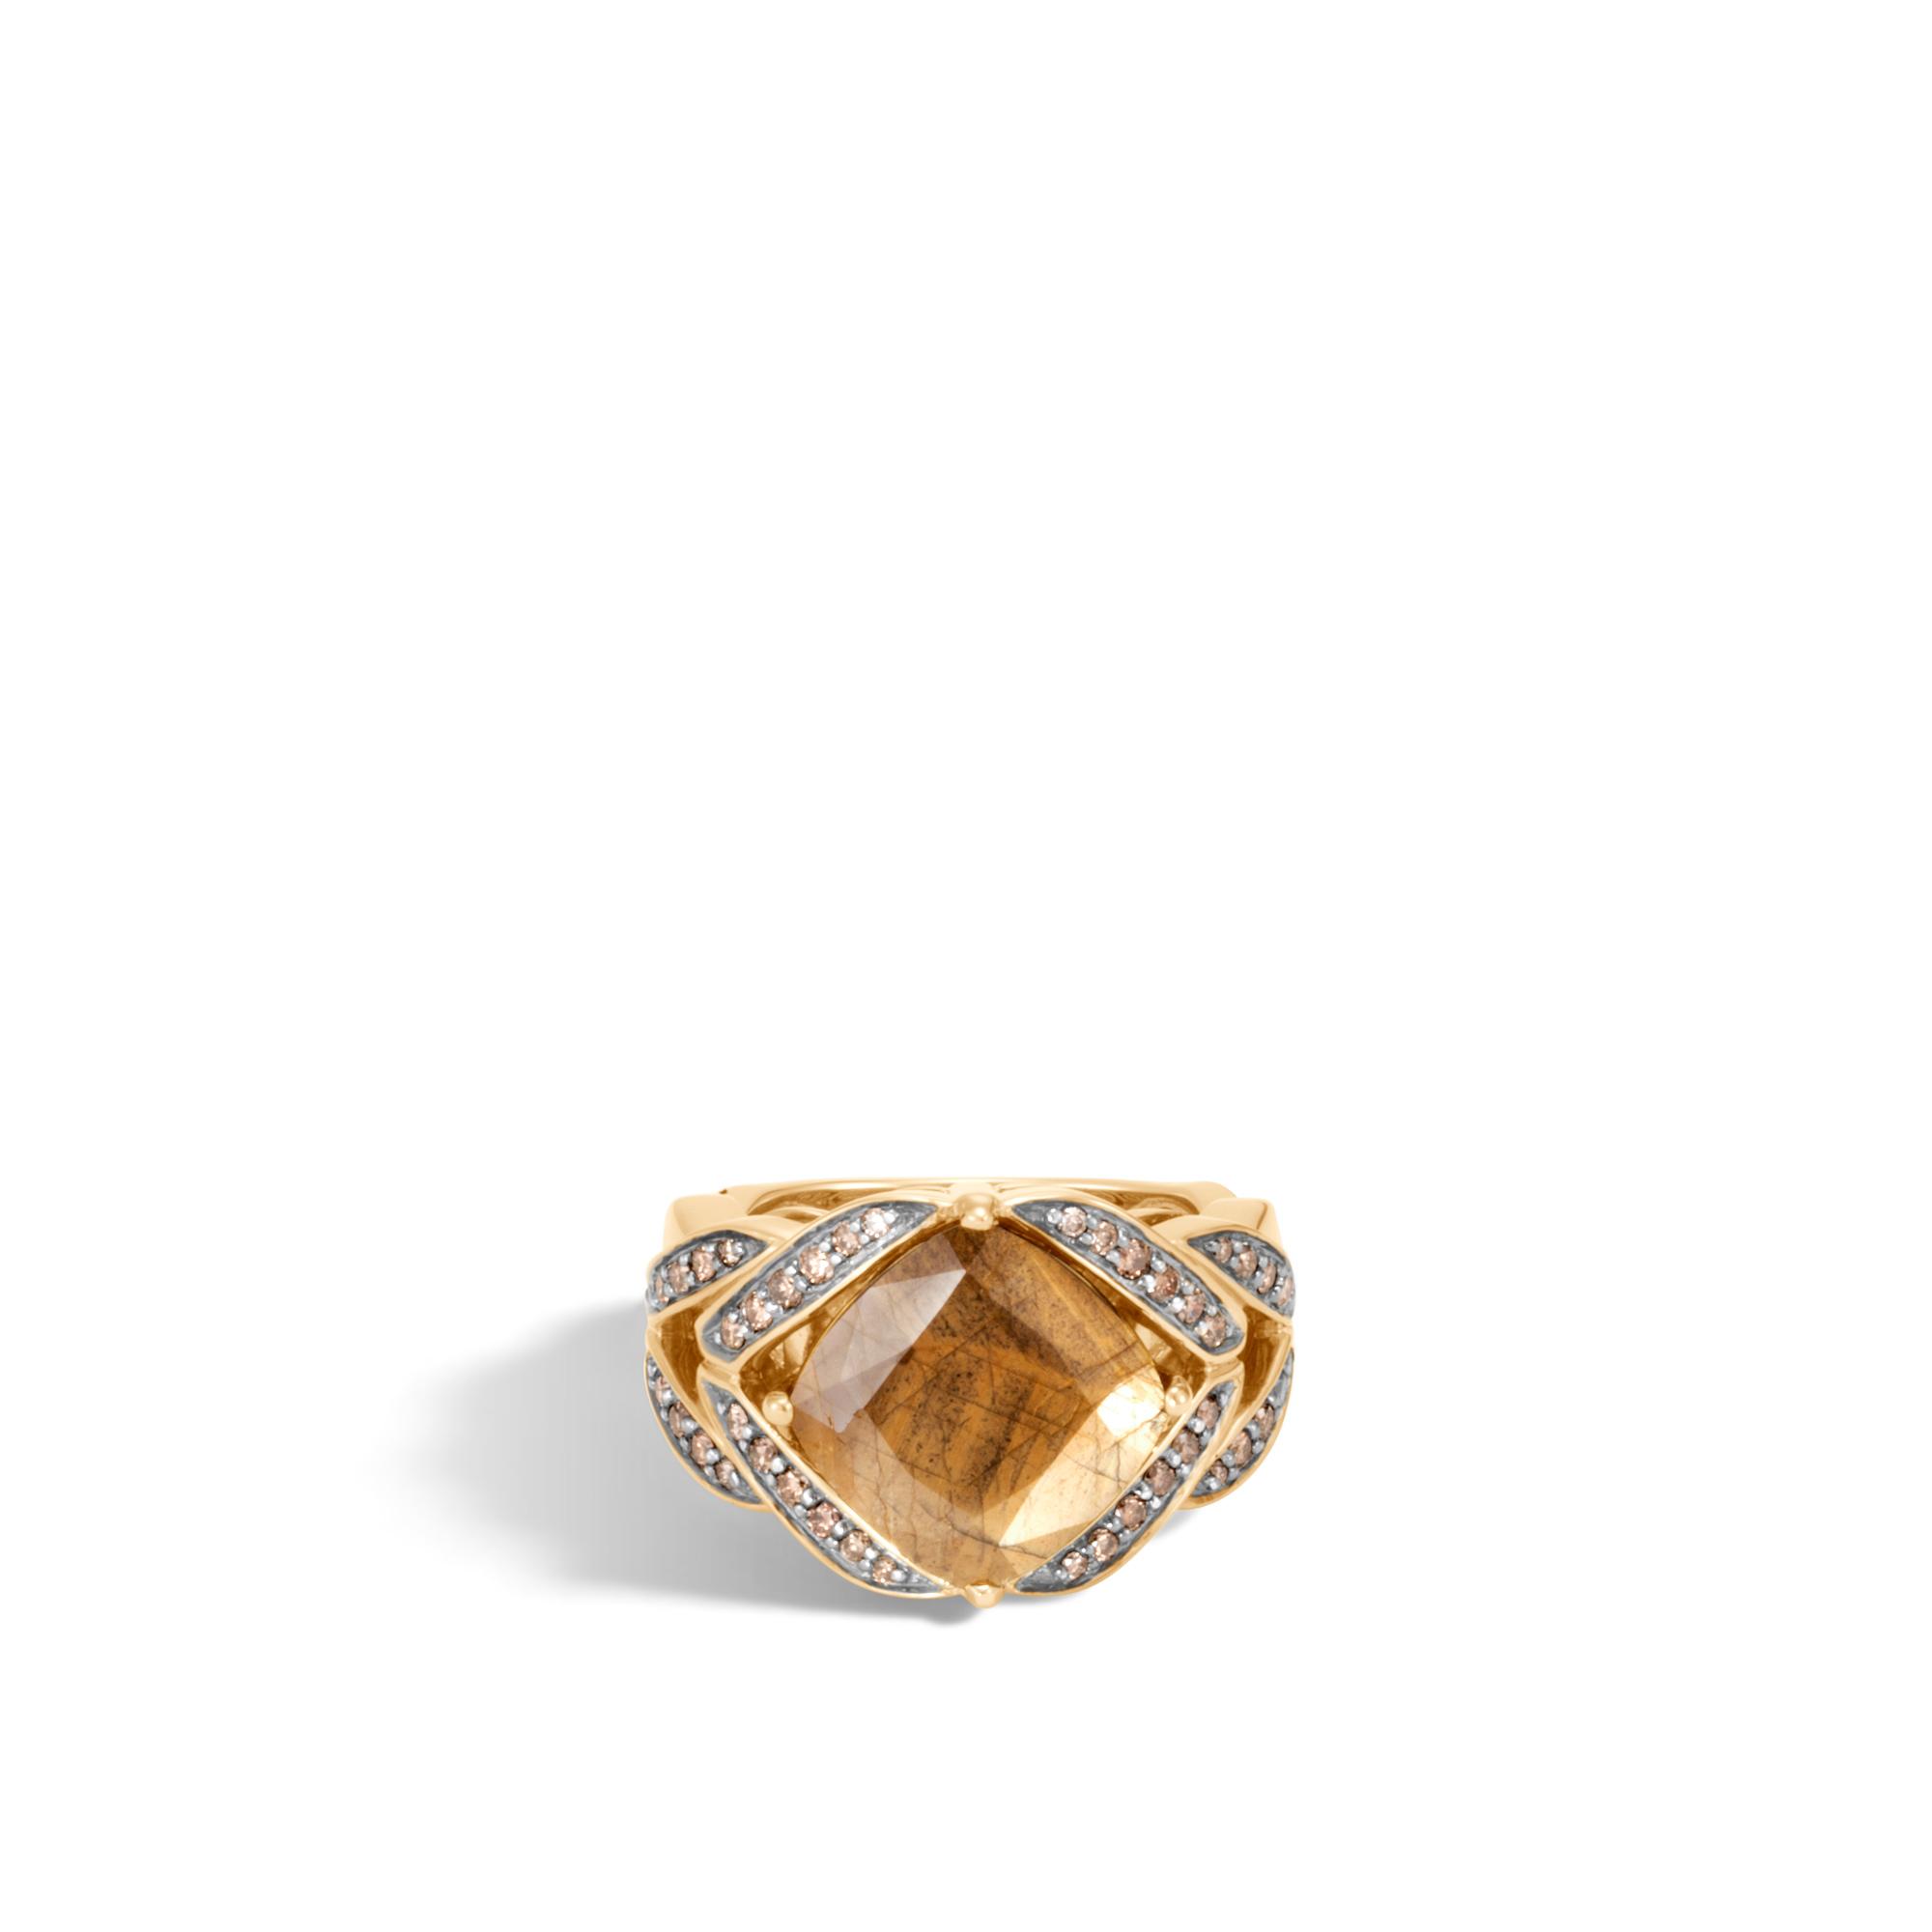 Modern Chain Magic Cut Ring, 18K Gold with Gemstone, Dia, Golden Sheen Sapphire, large